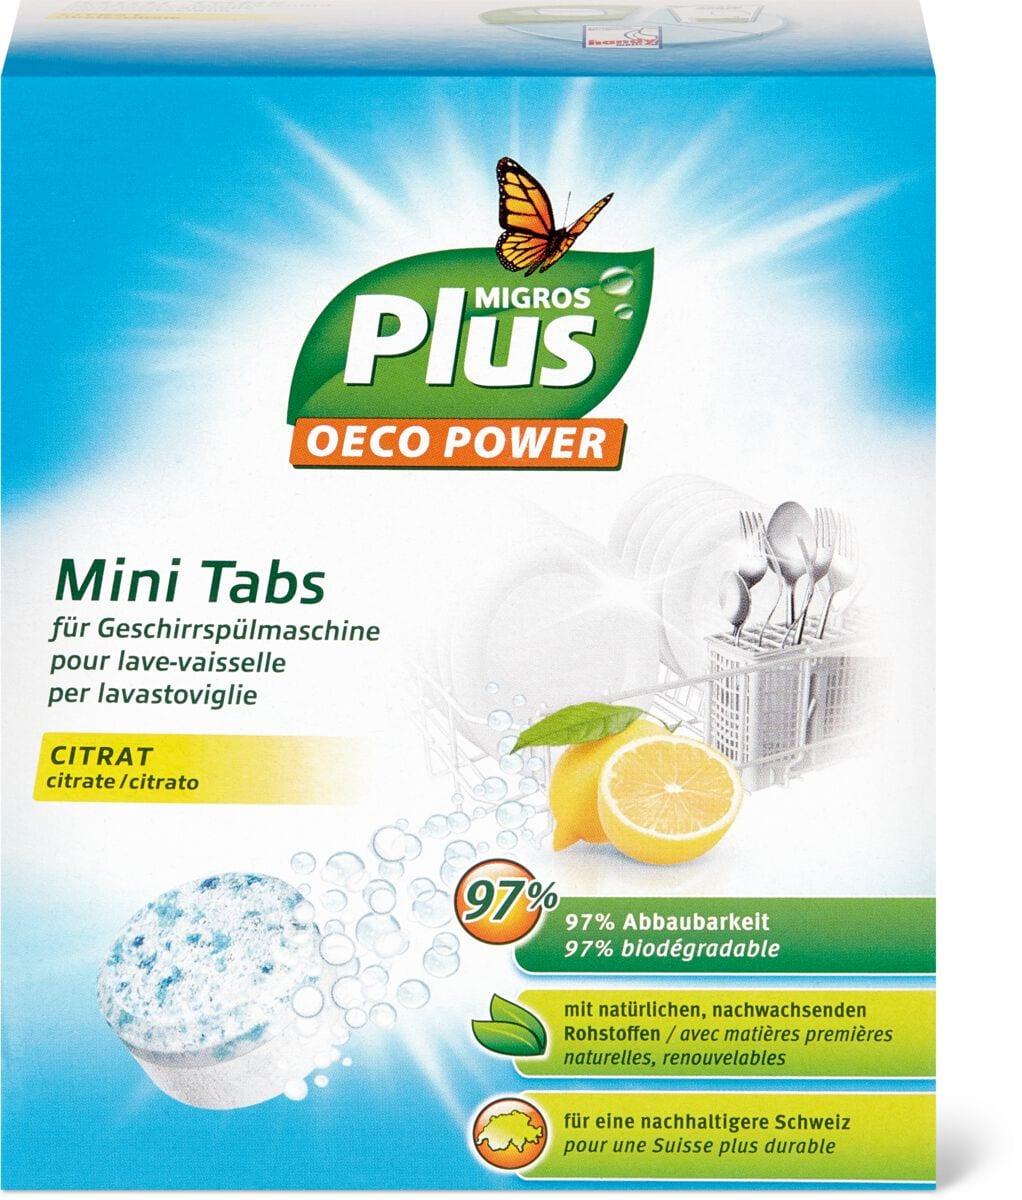 M-Plus Geschirrspülmaschinen Mini Tabs